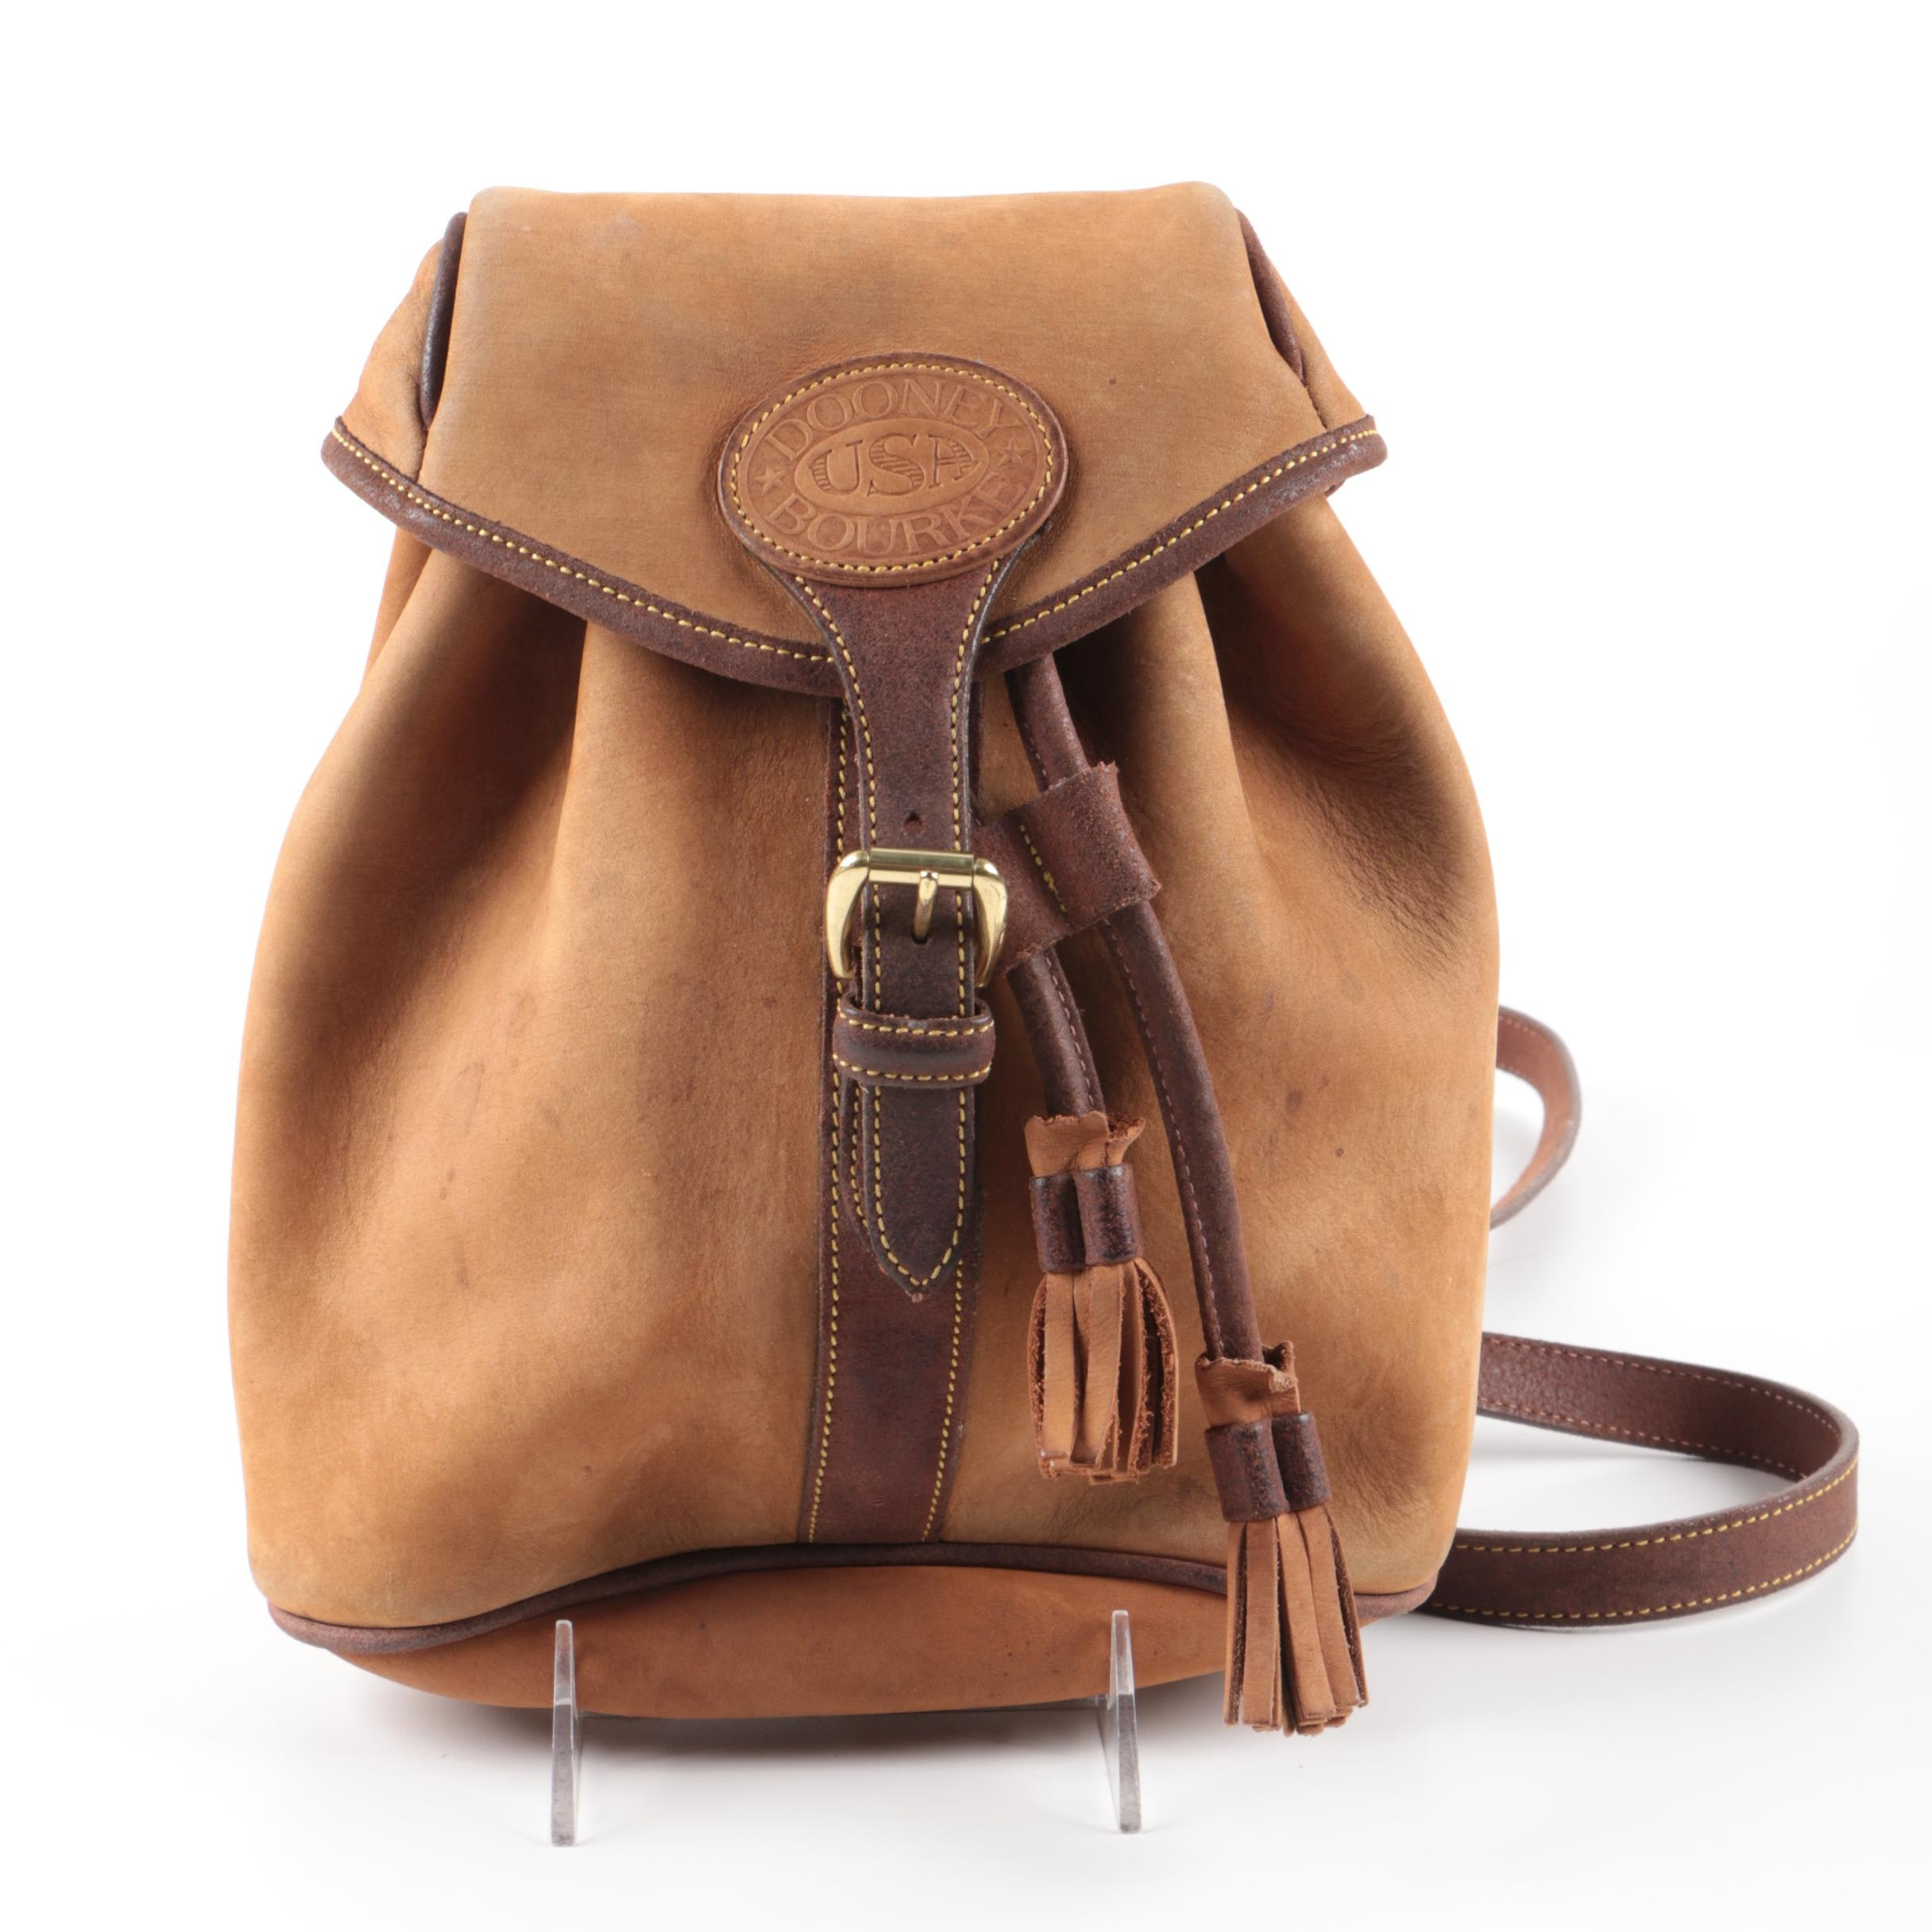 Vintage Dooney \u0026 Bourke Tan Nubuck Leather Backpack